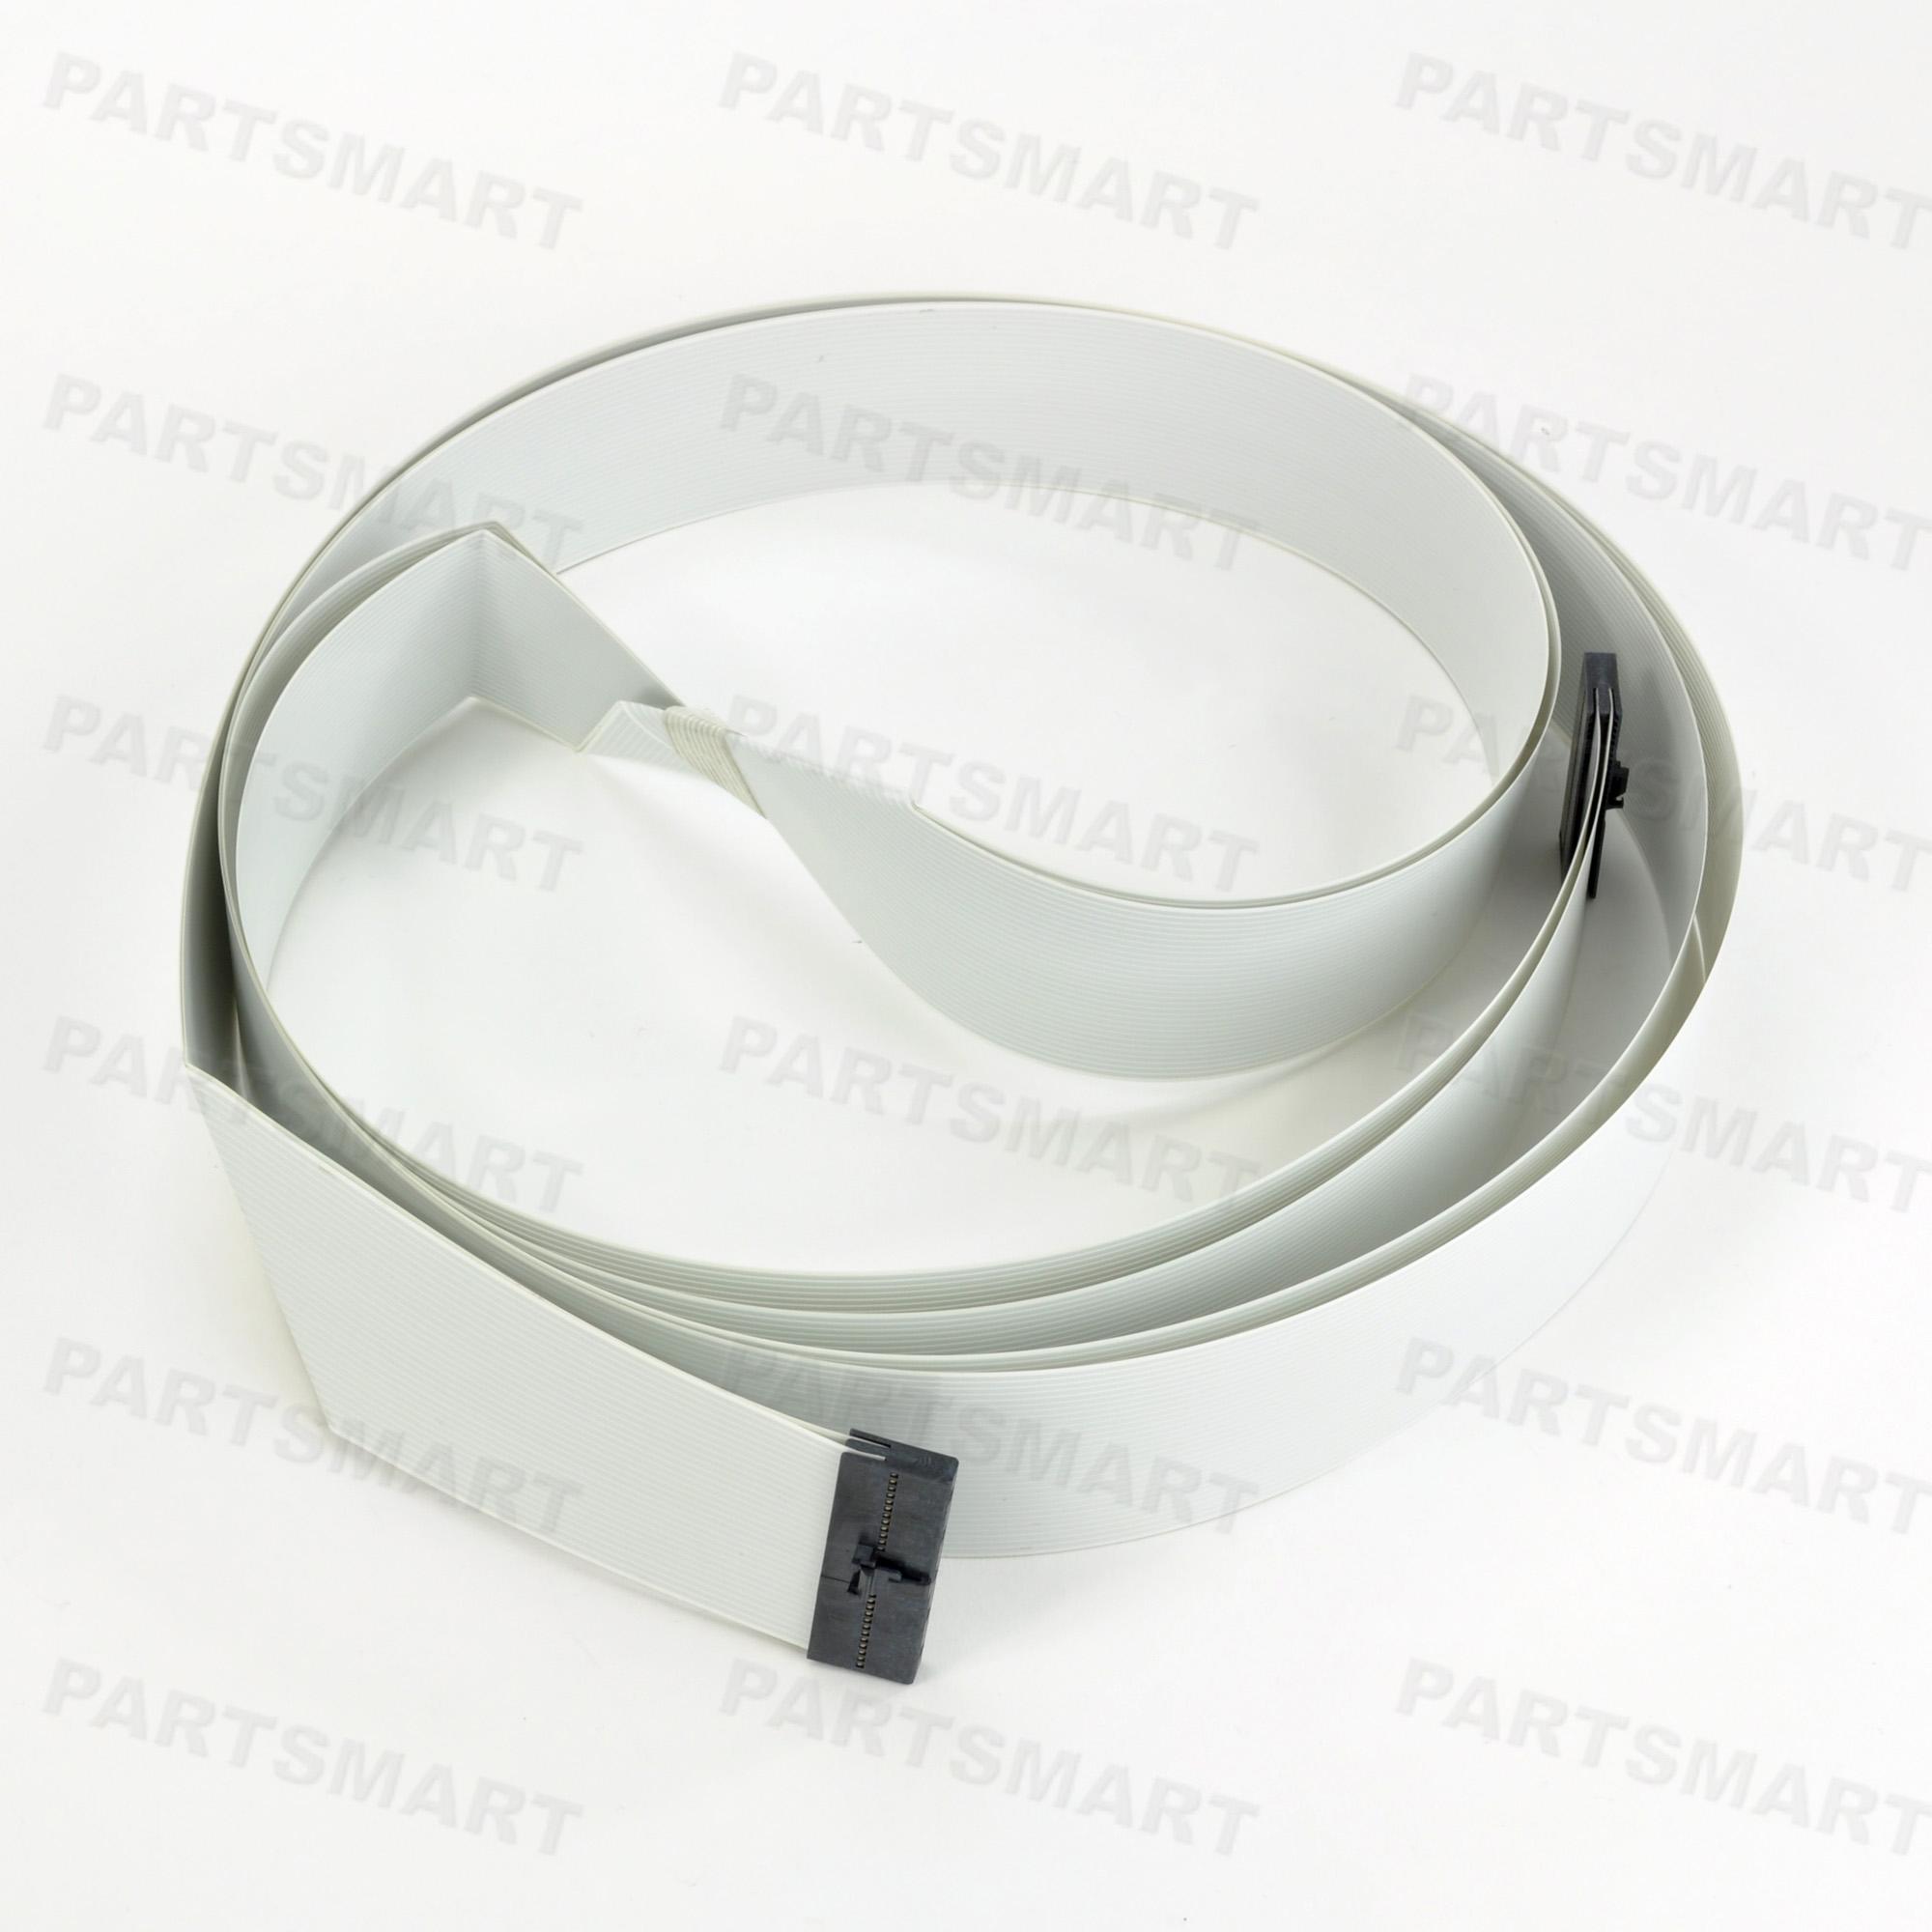 HP Designjet 450 Plotter Parts | Partsmart